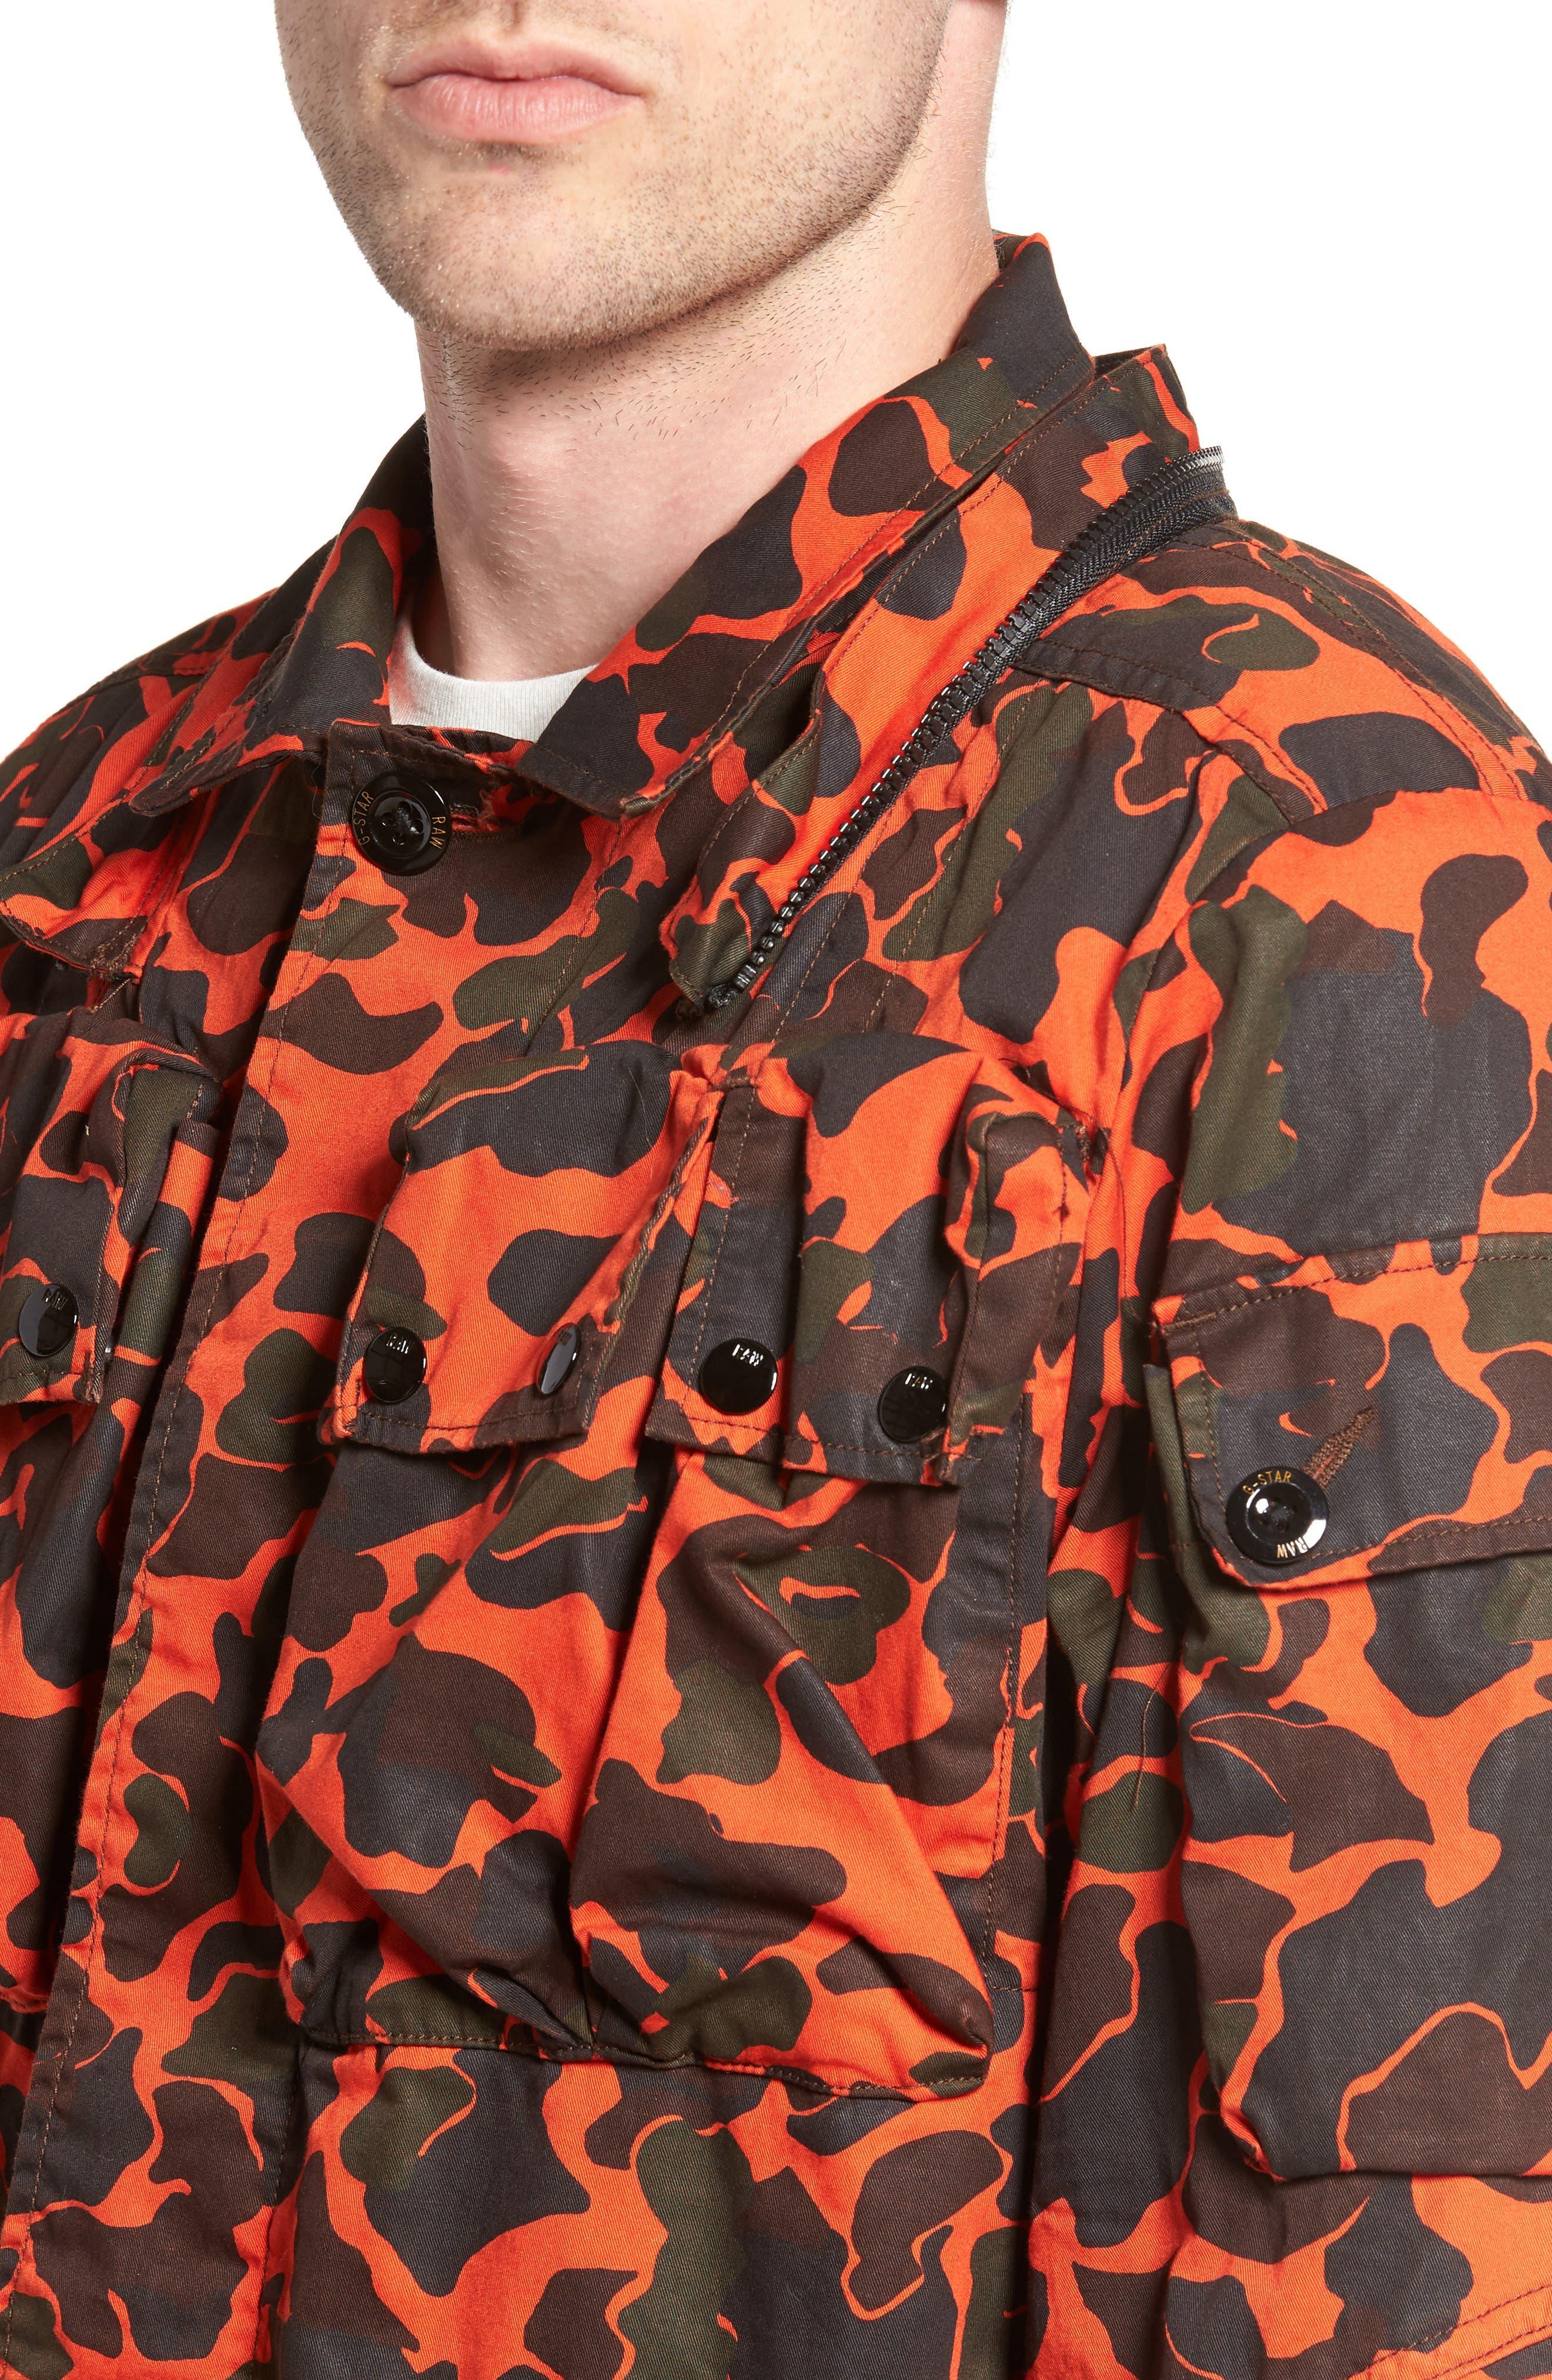 Ospak Submarine Hooded Jacket,                             Alternate thumbnail 4, color,                             800